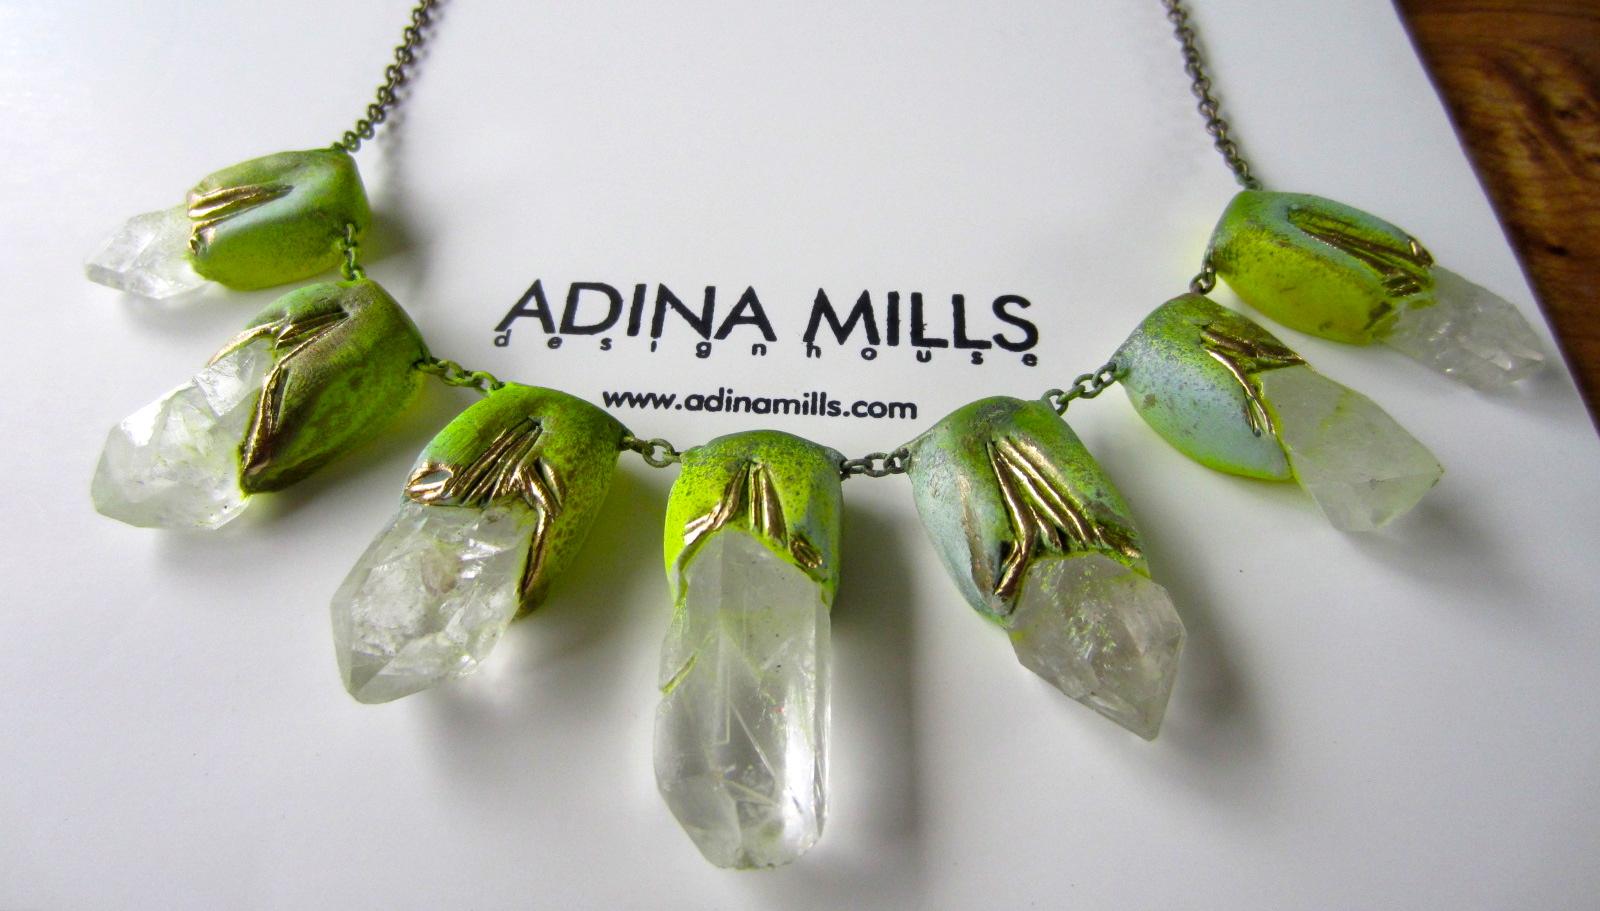 Adina Mills